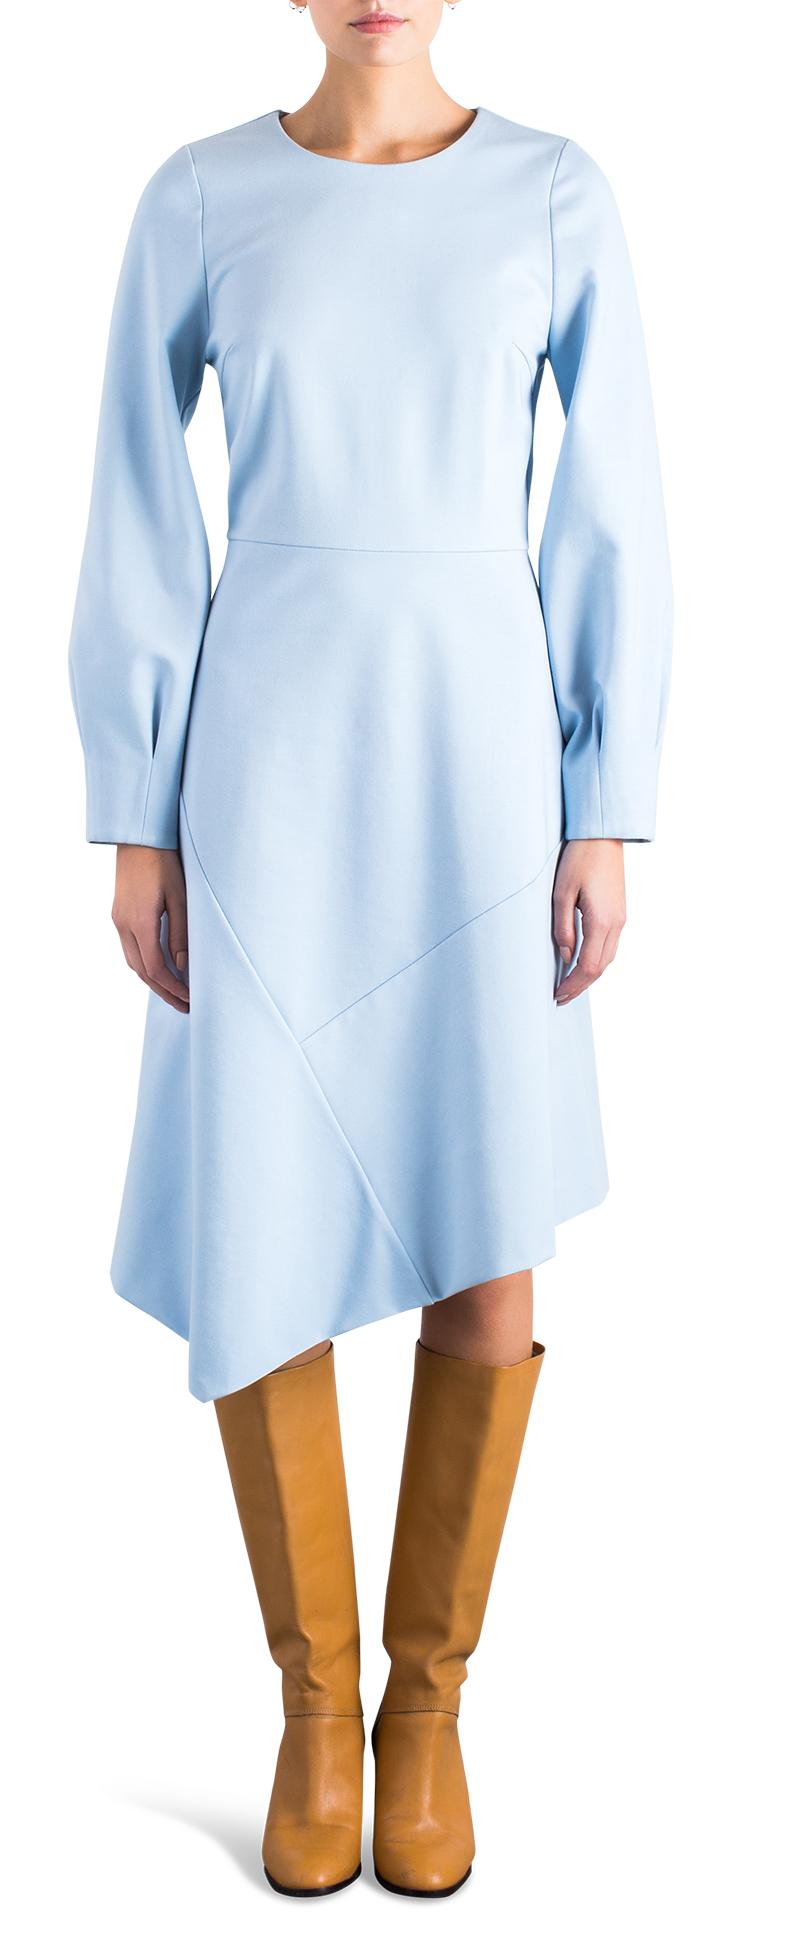 Bild 1 av Presence dress